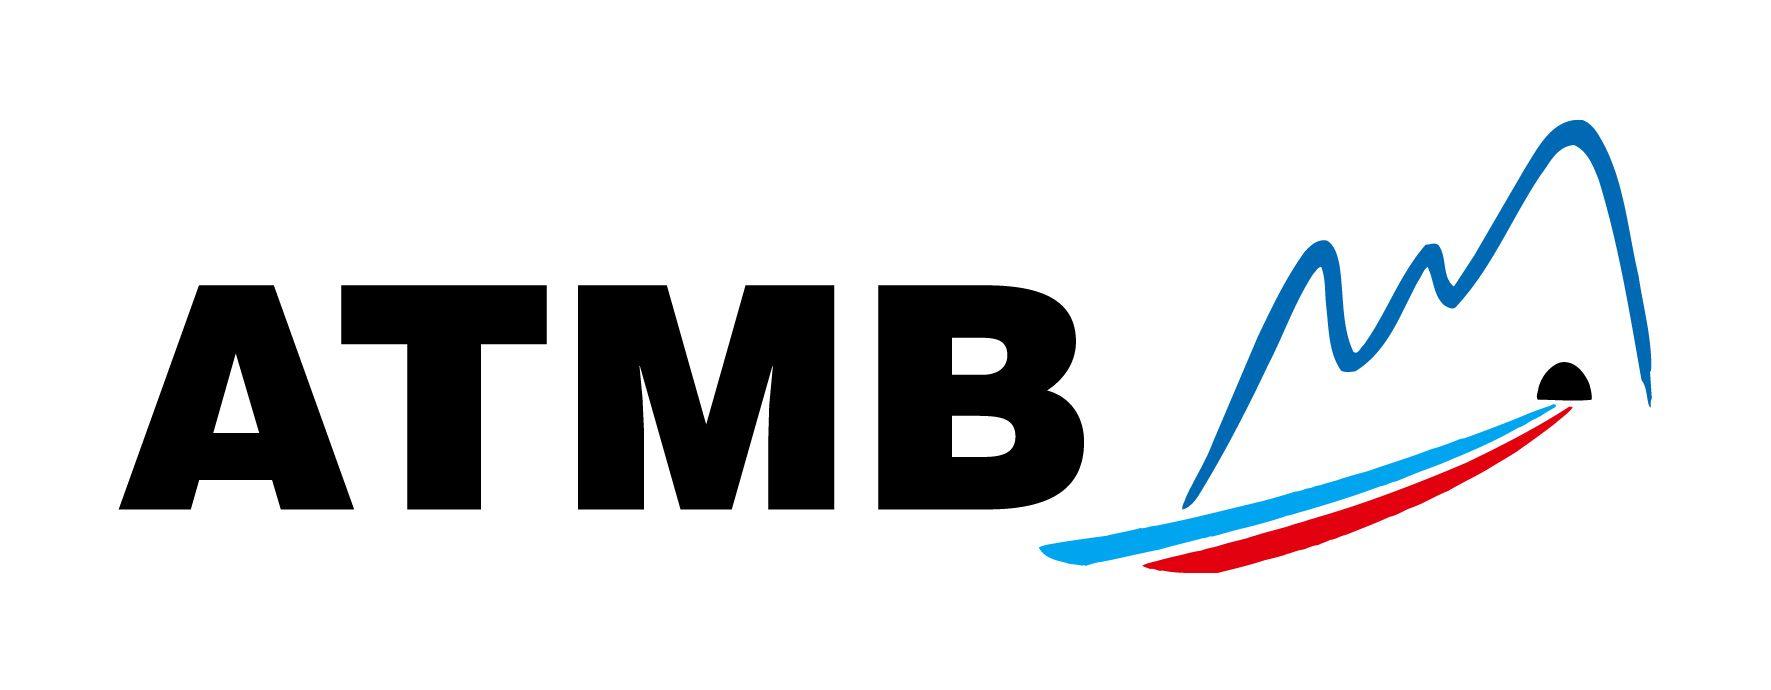 ATMB - logo #BursonMarstellerParis